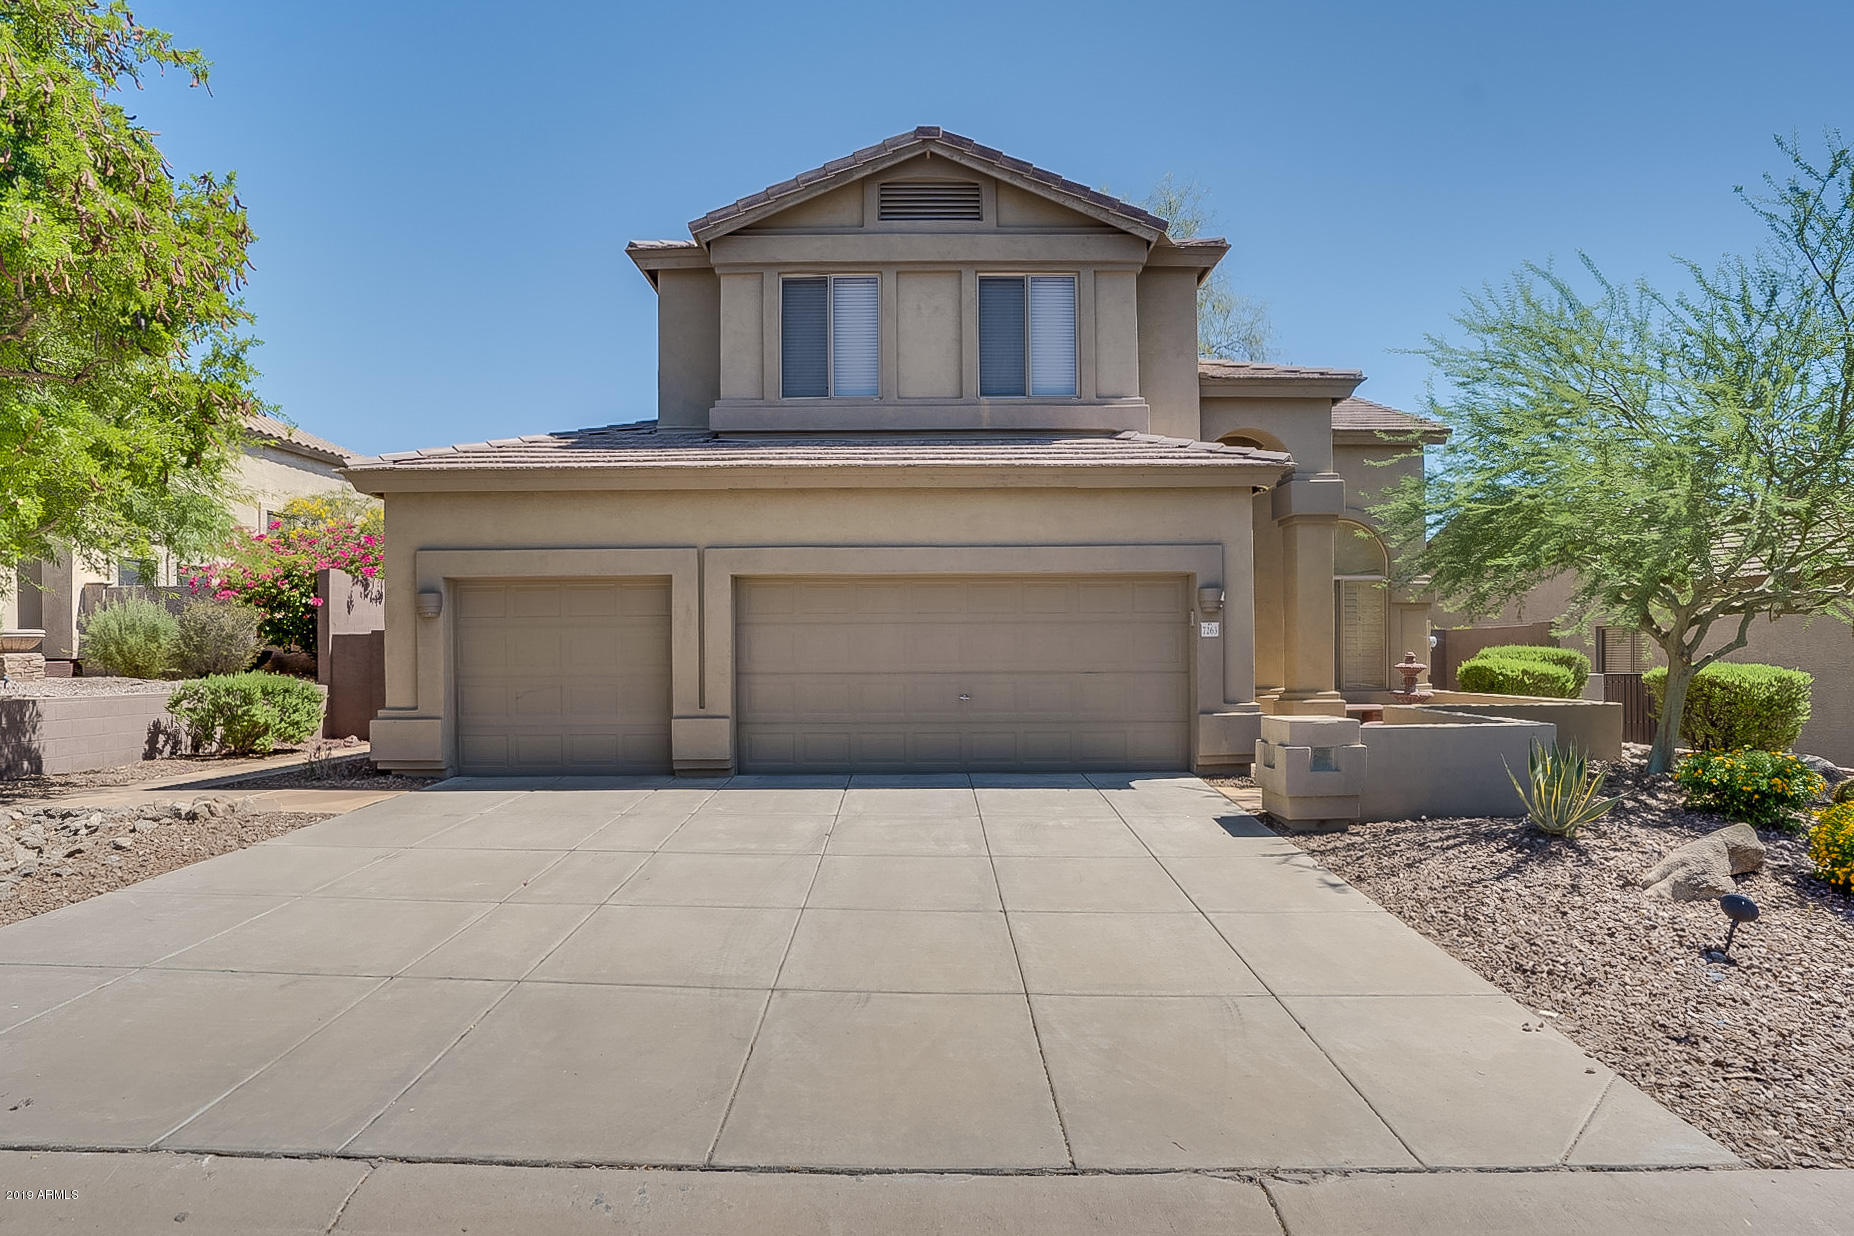 Photo of 7263 E TYNDALL Street, Mesa, AZ 85207